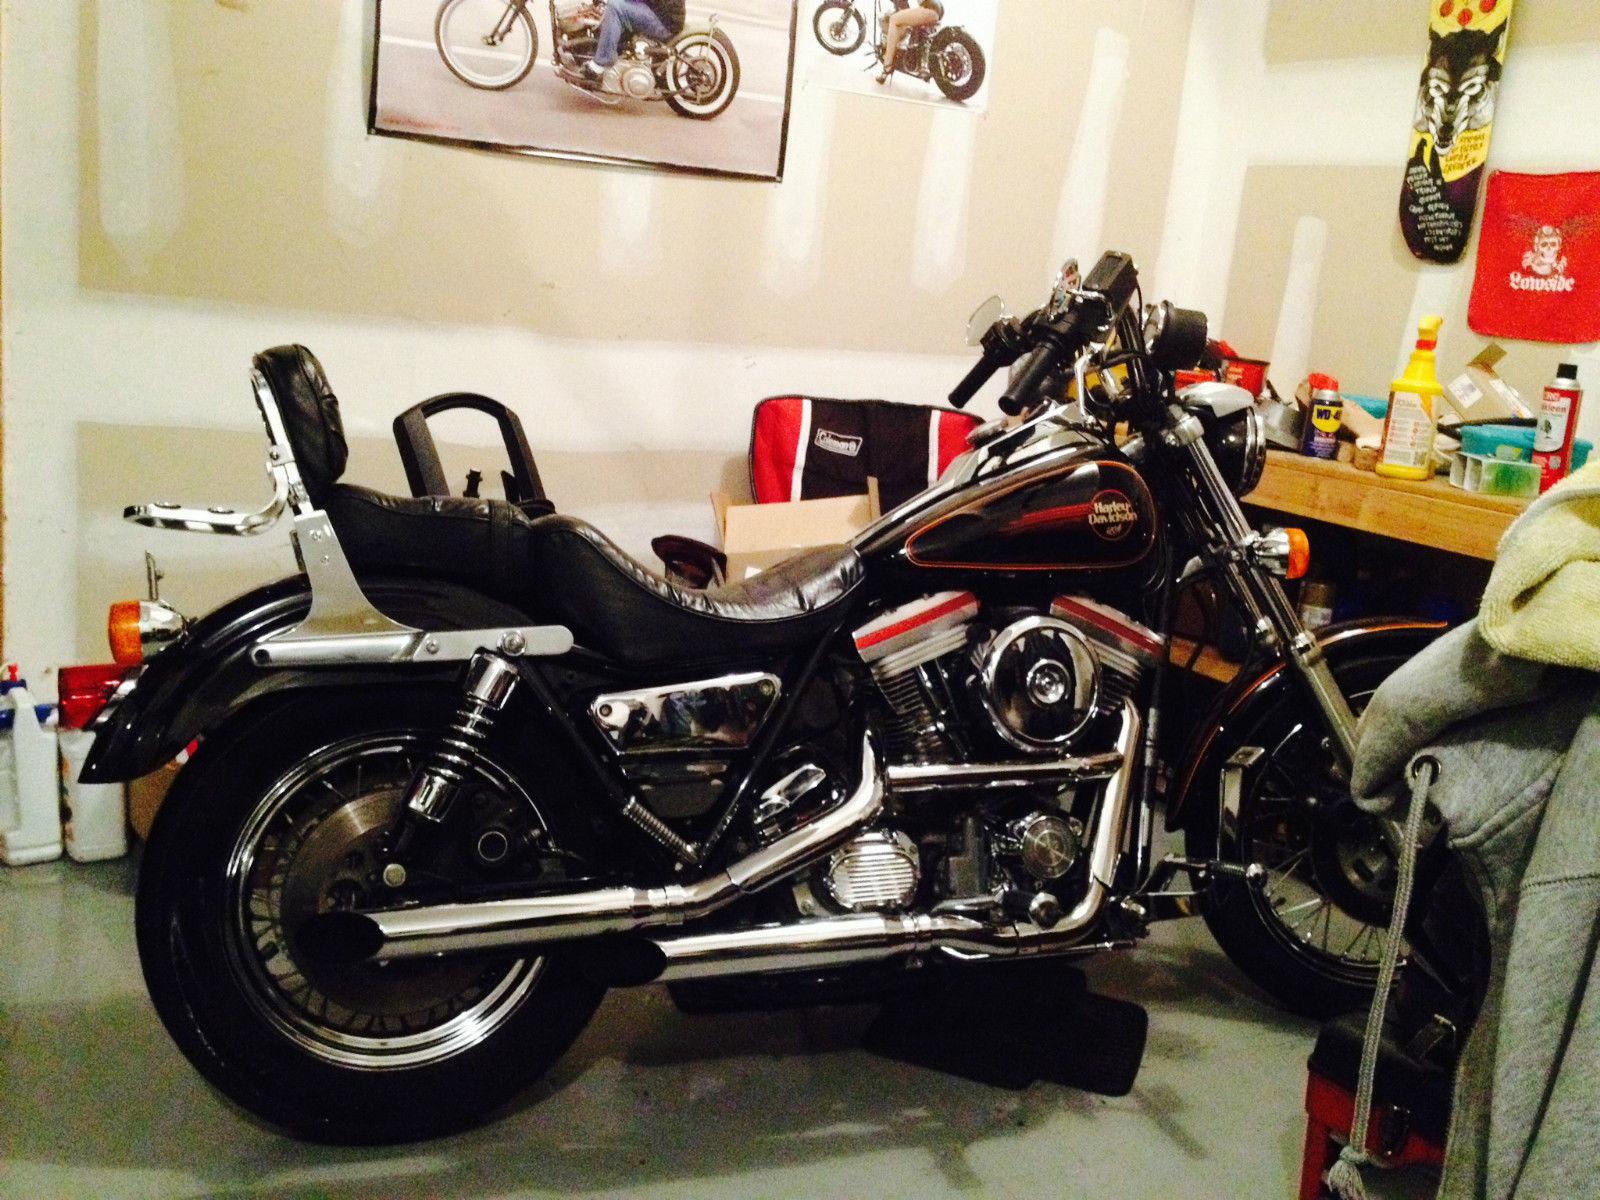 1990 Harley Davidson FXR FXRS-Convertible Super Glide